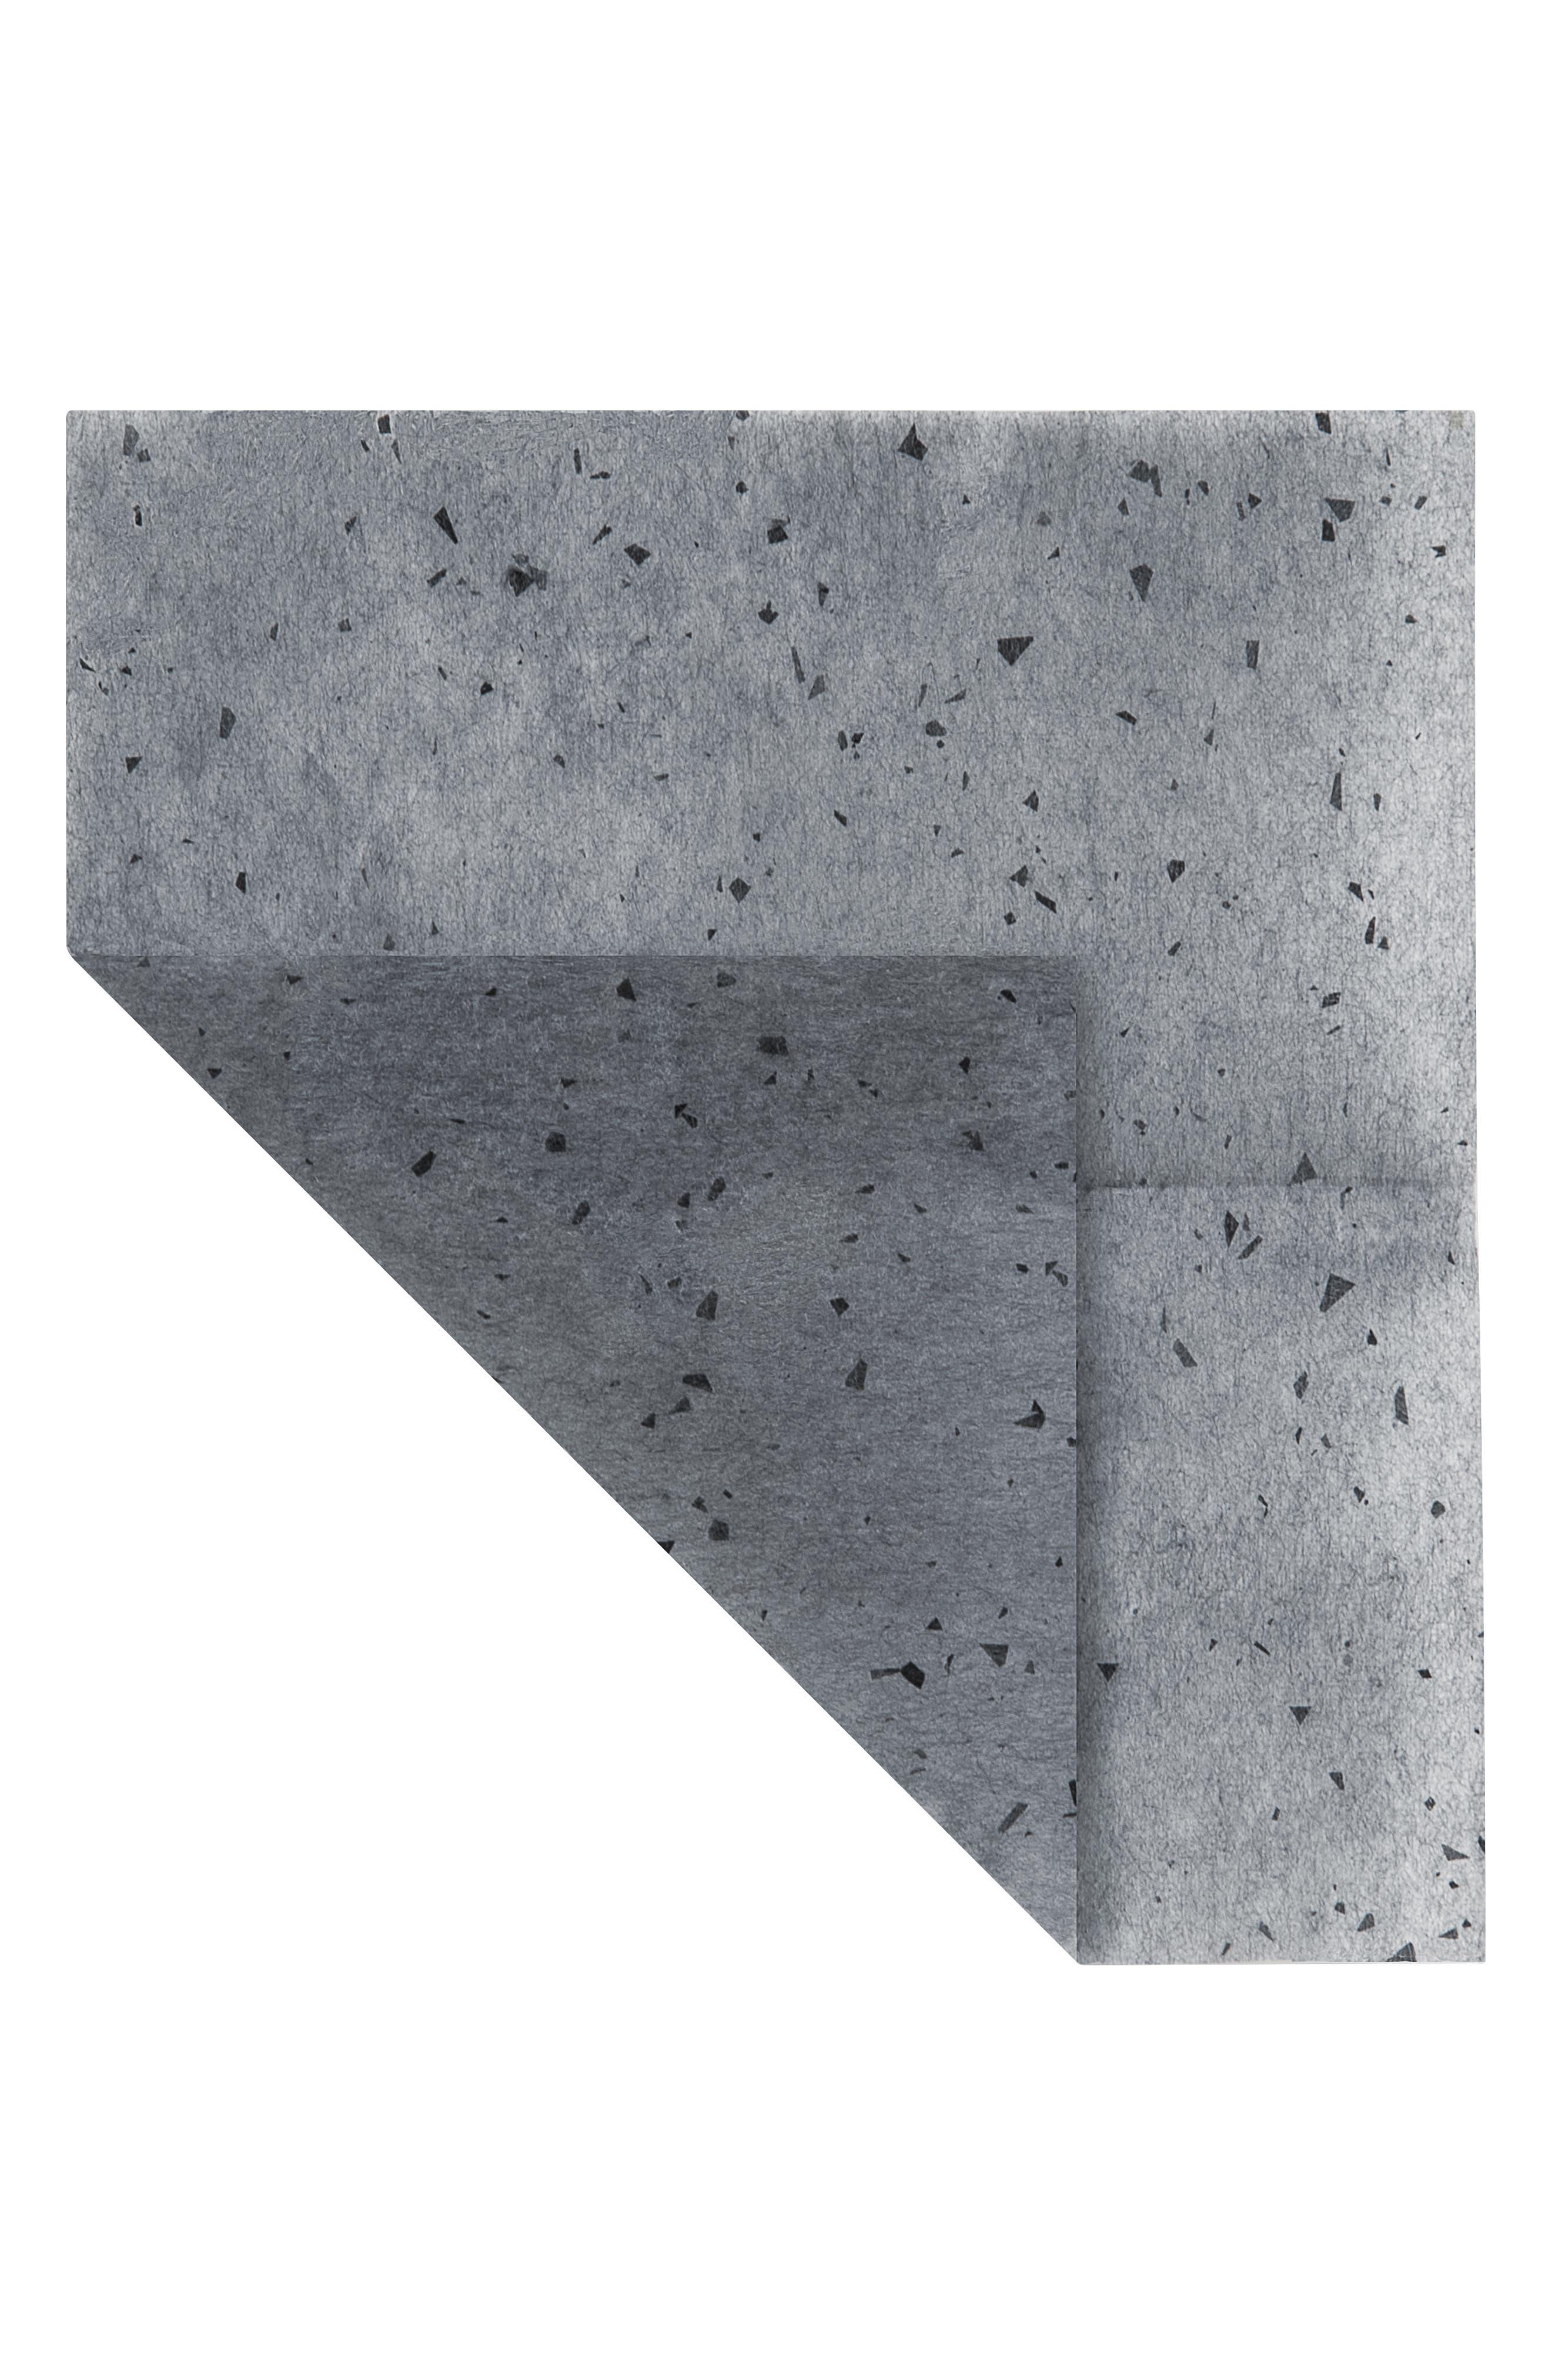 Black Charcoal Blotting Linens,                             Alternate thumbnail 2, color,                             NO COLOR